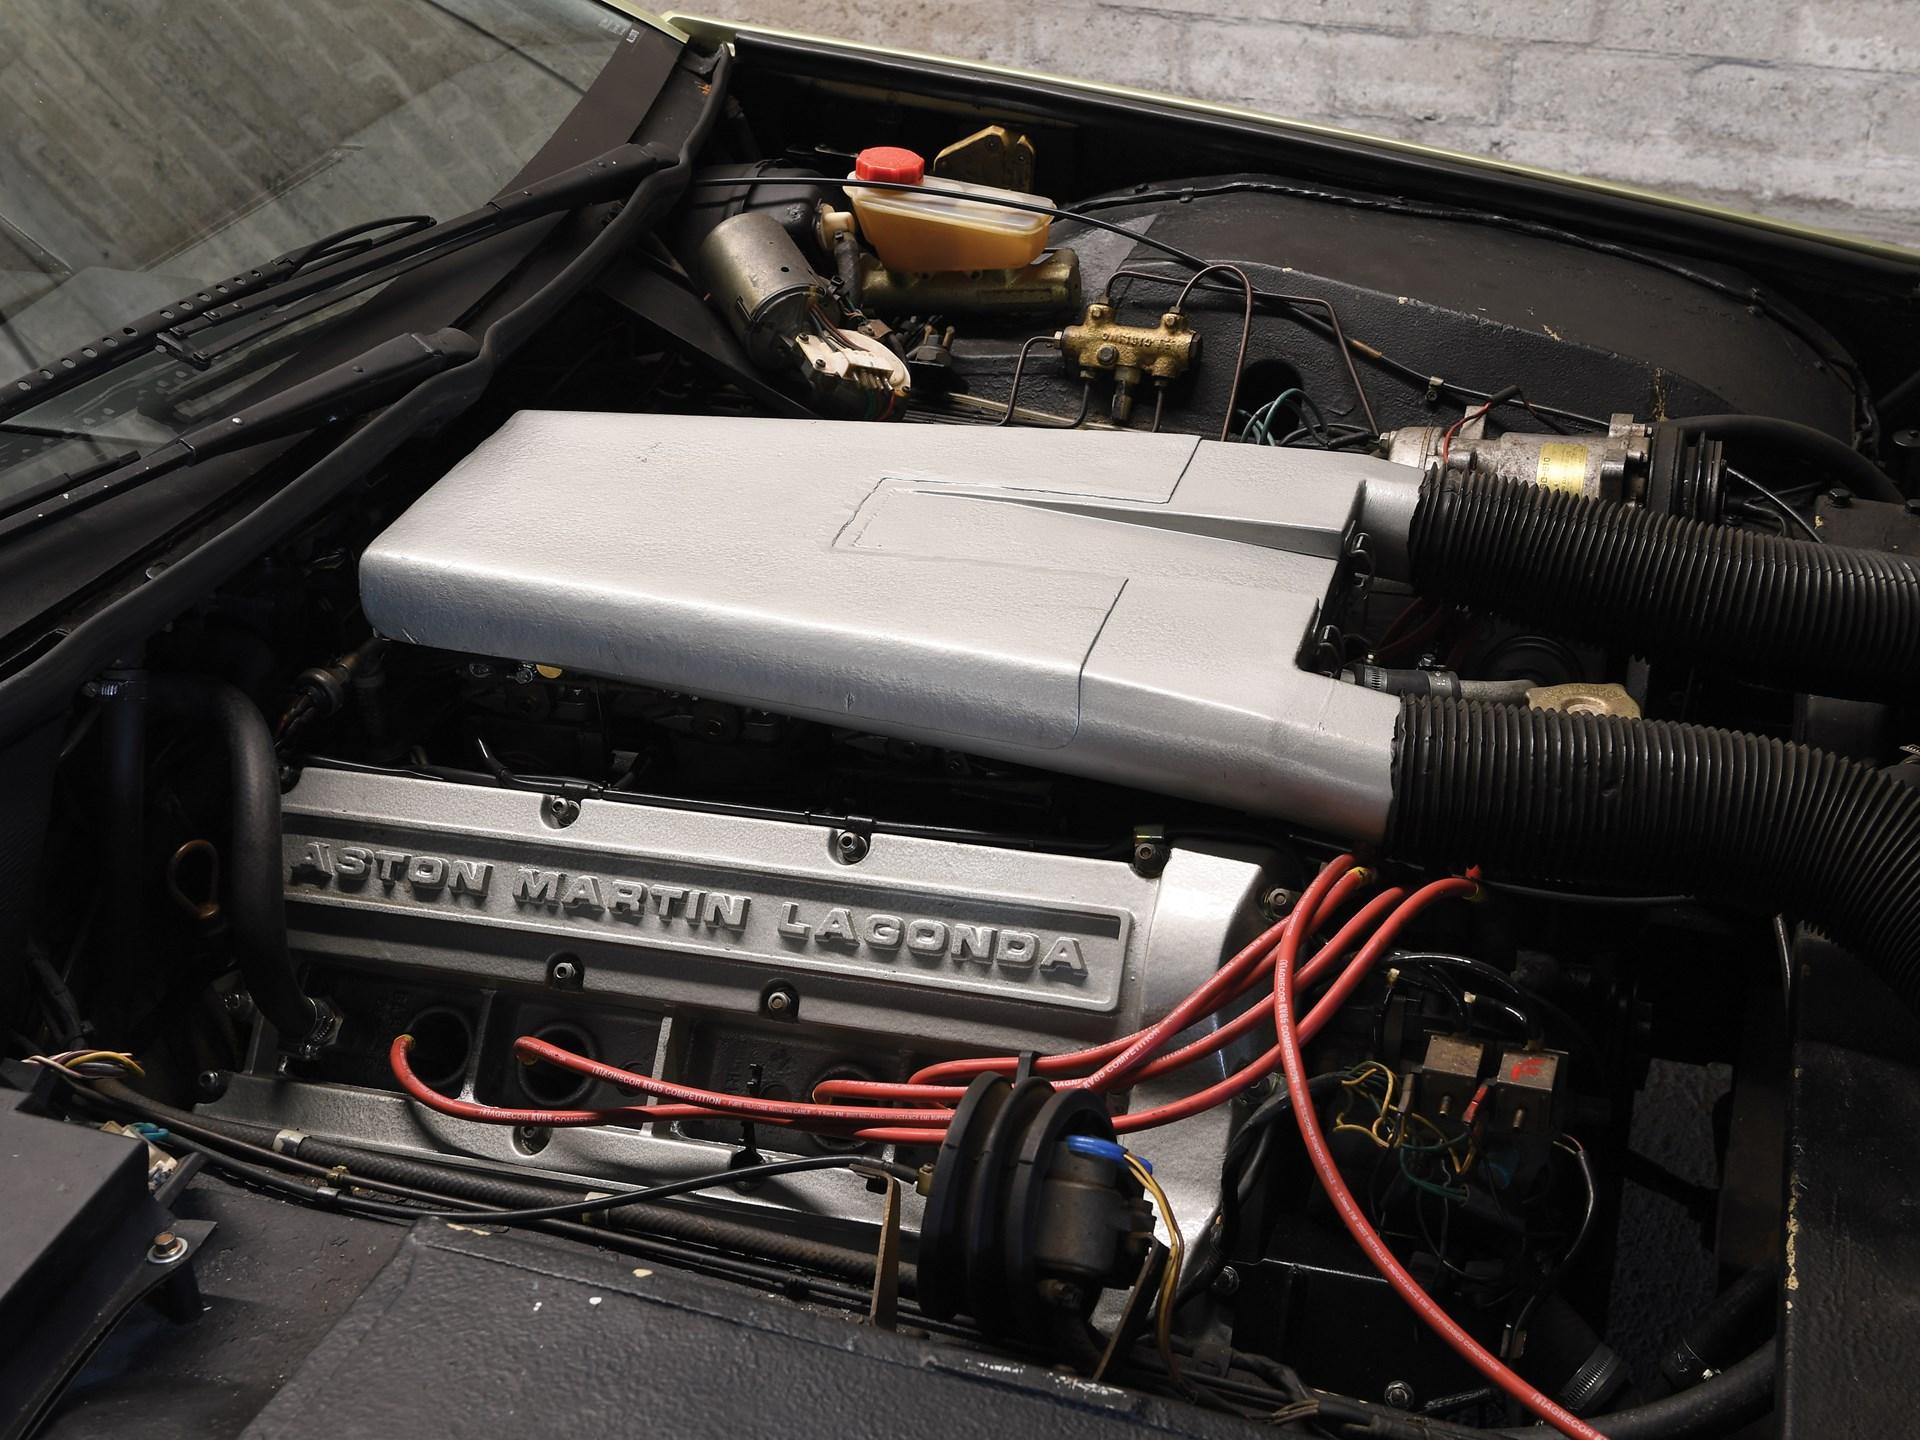 1983 Aston Martin Tickford Lagonda engine